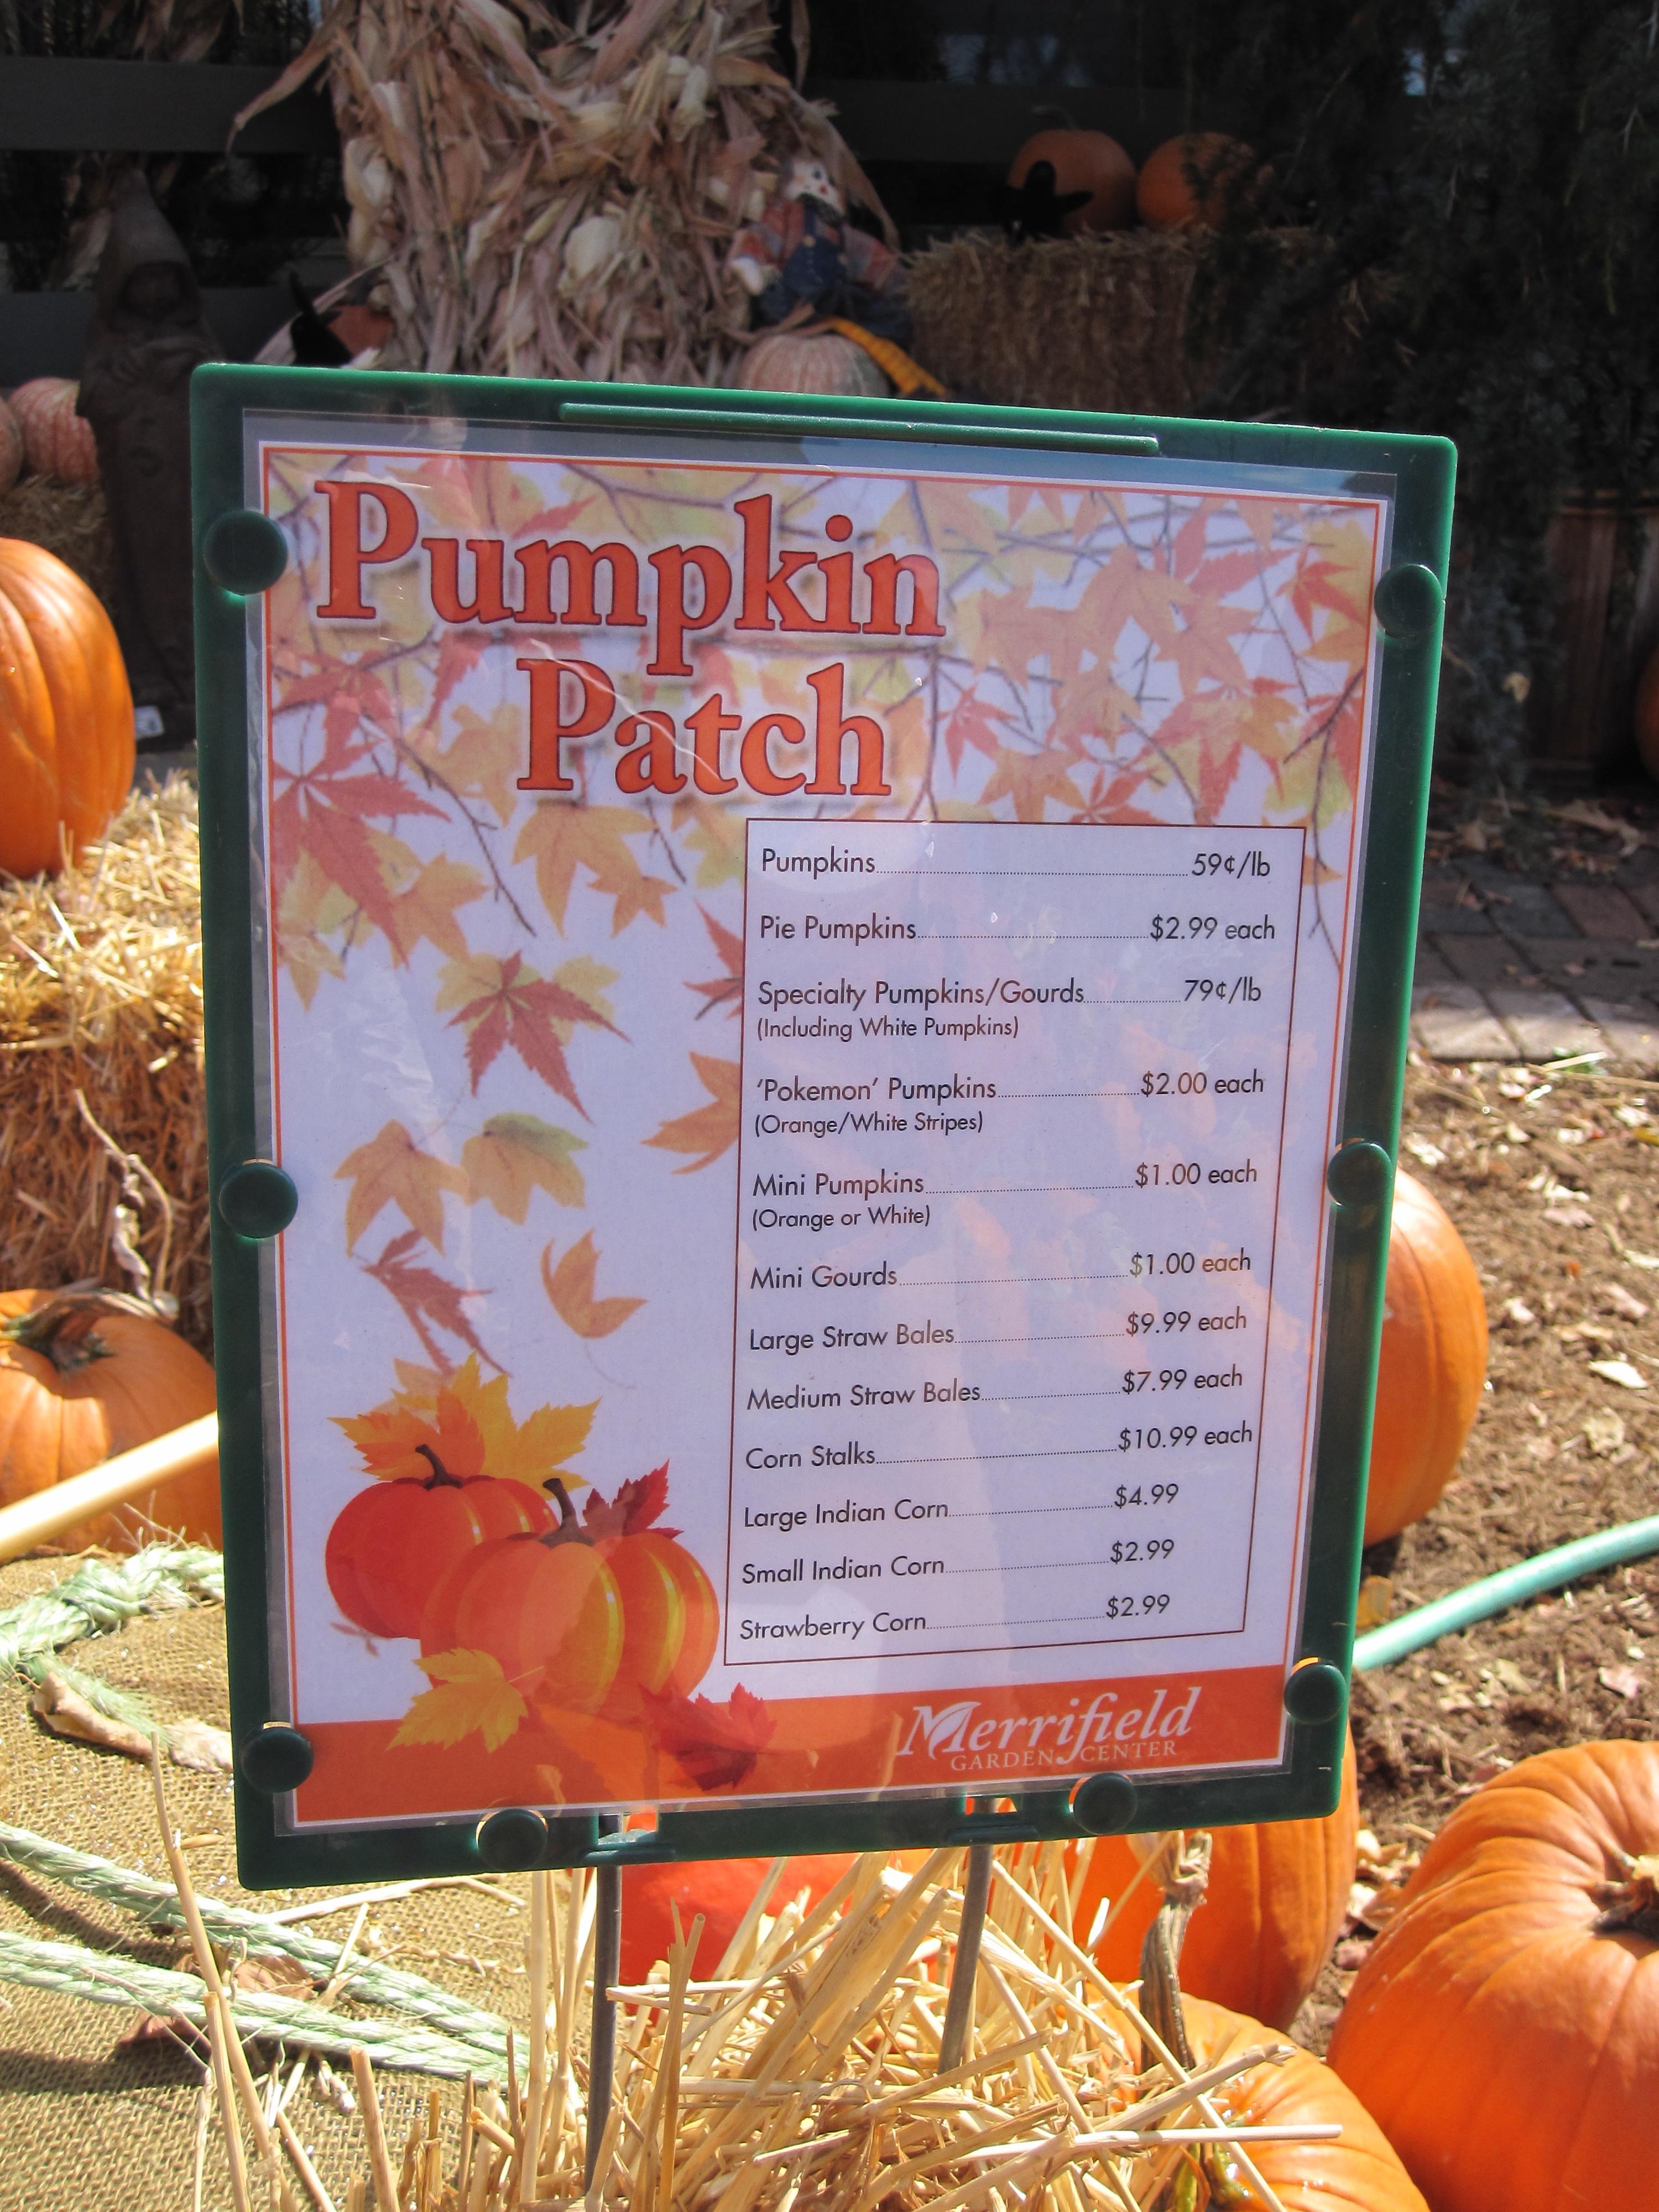 Pumpkin Prices At Merrifield Garden Center